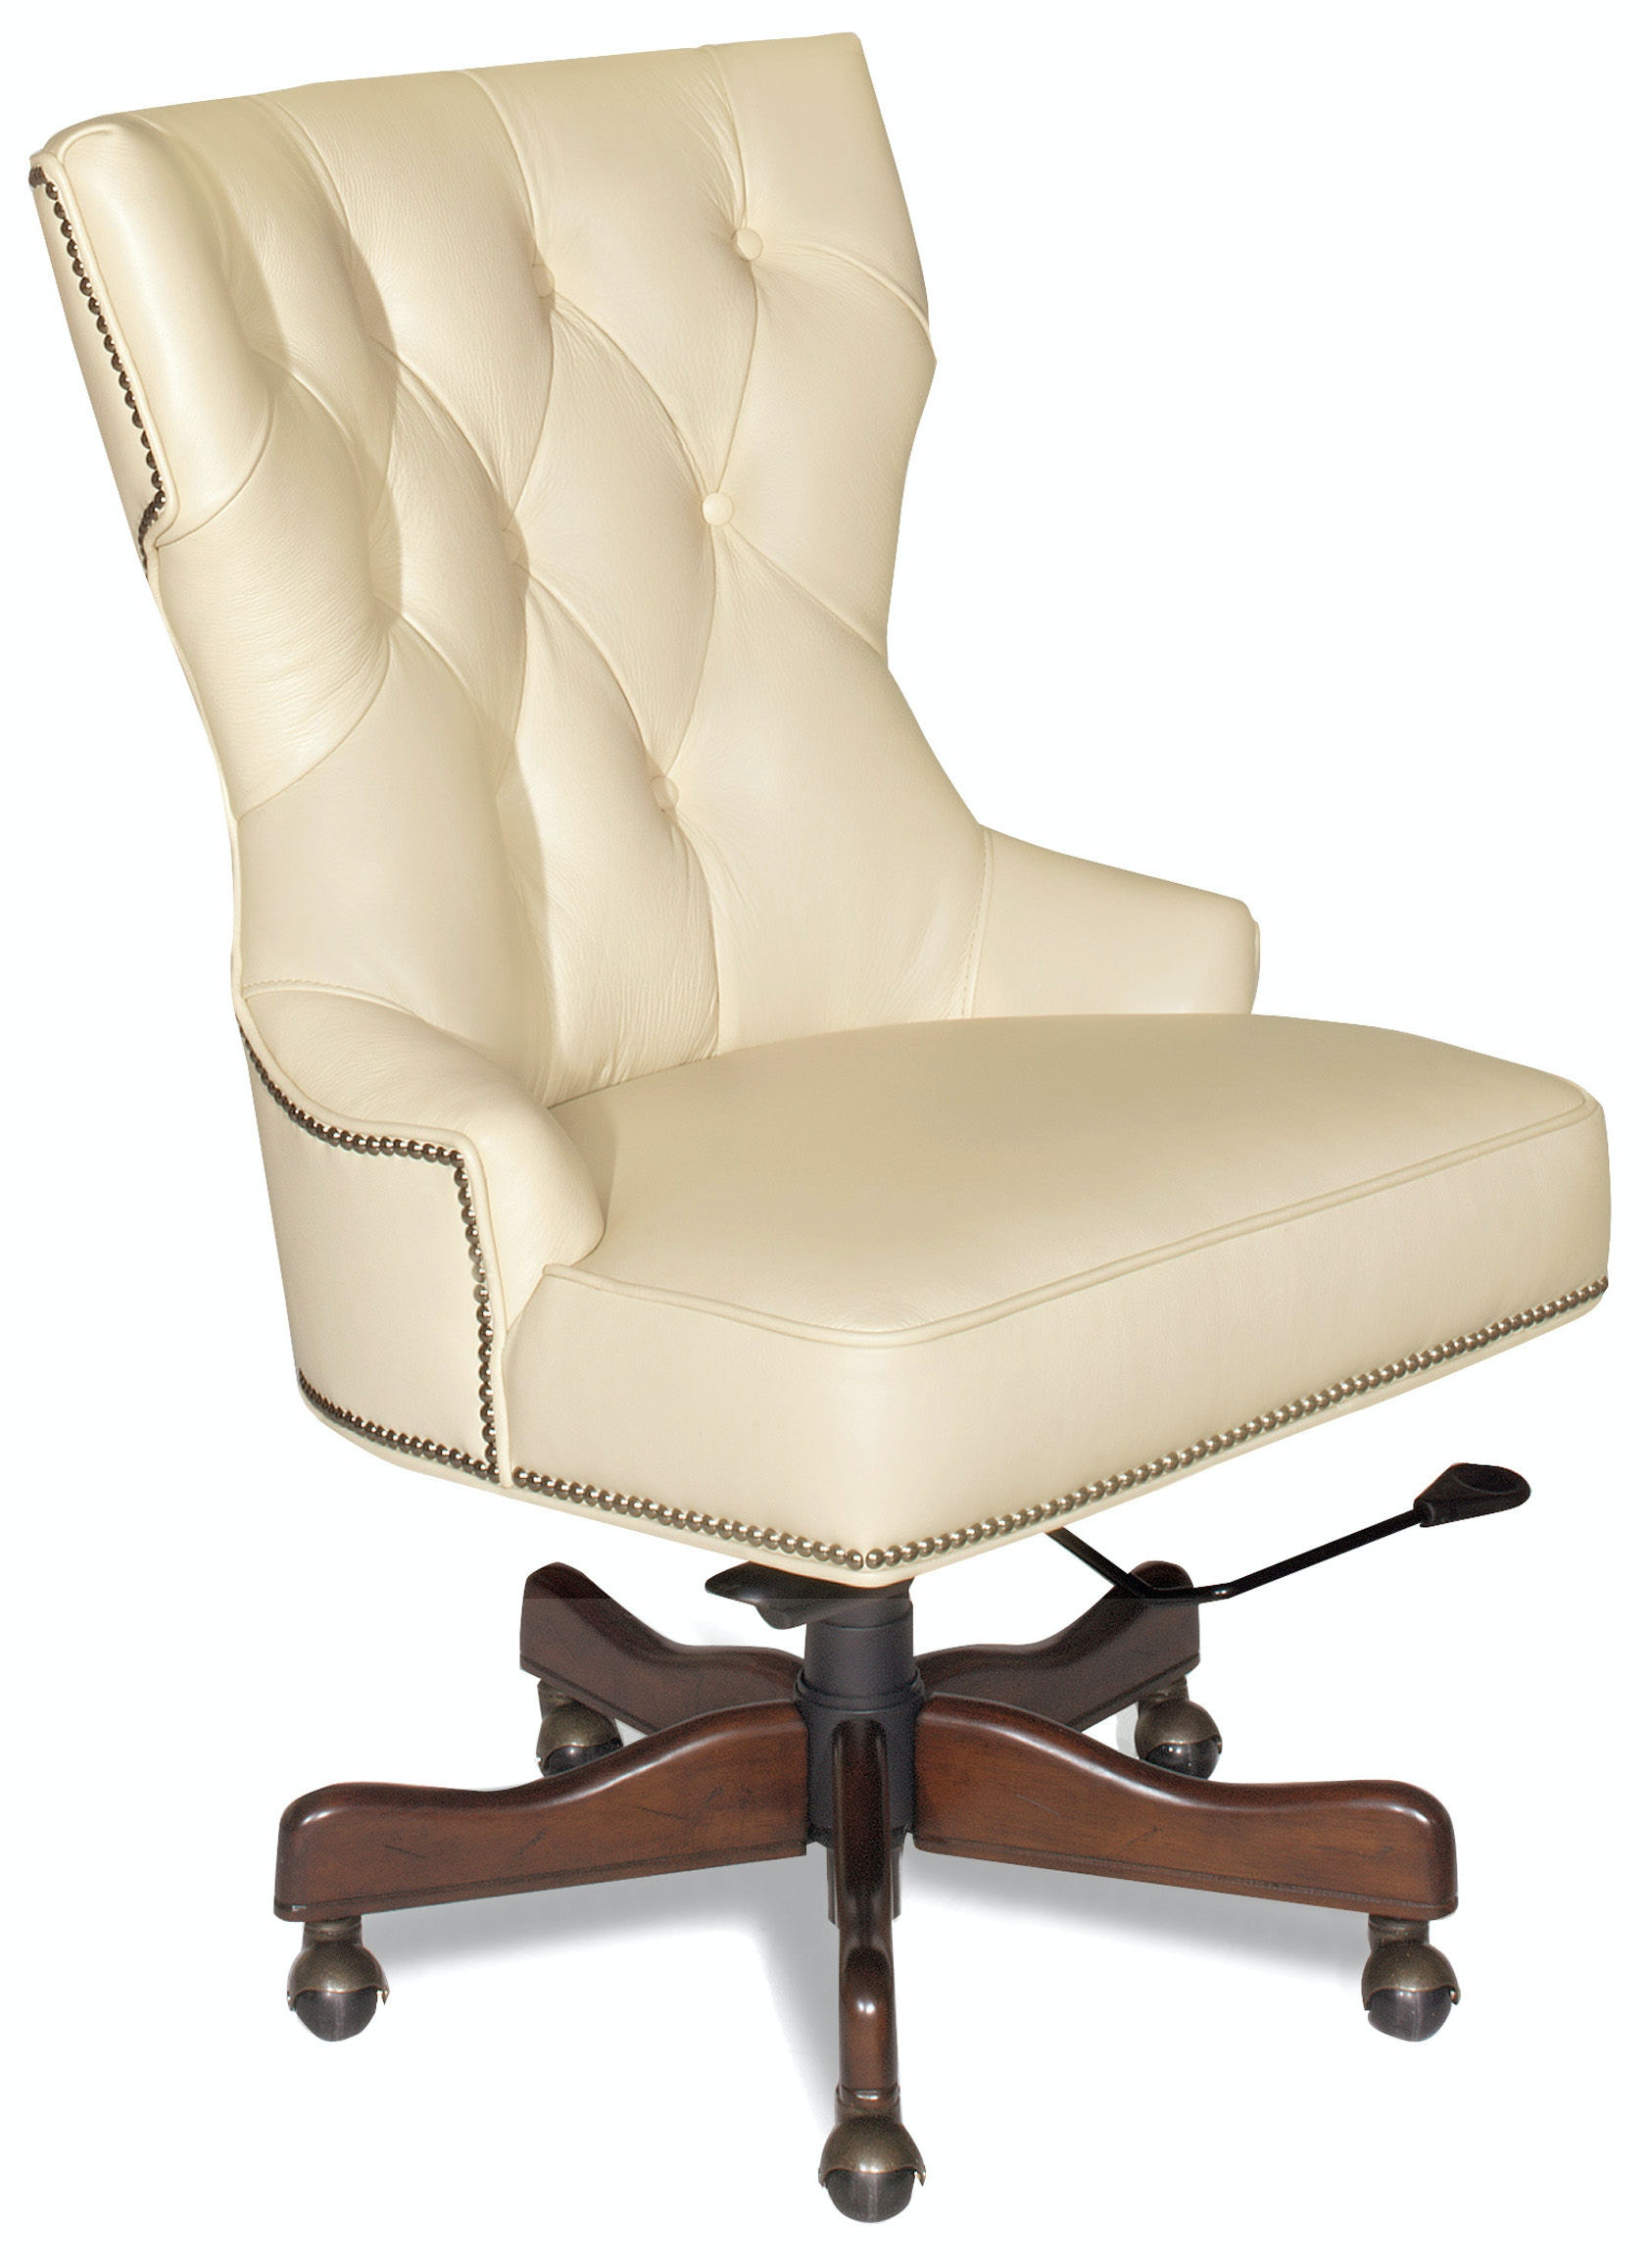 Genial Hooker Furniture Primm Desk Chair EC379 081